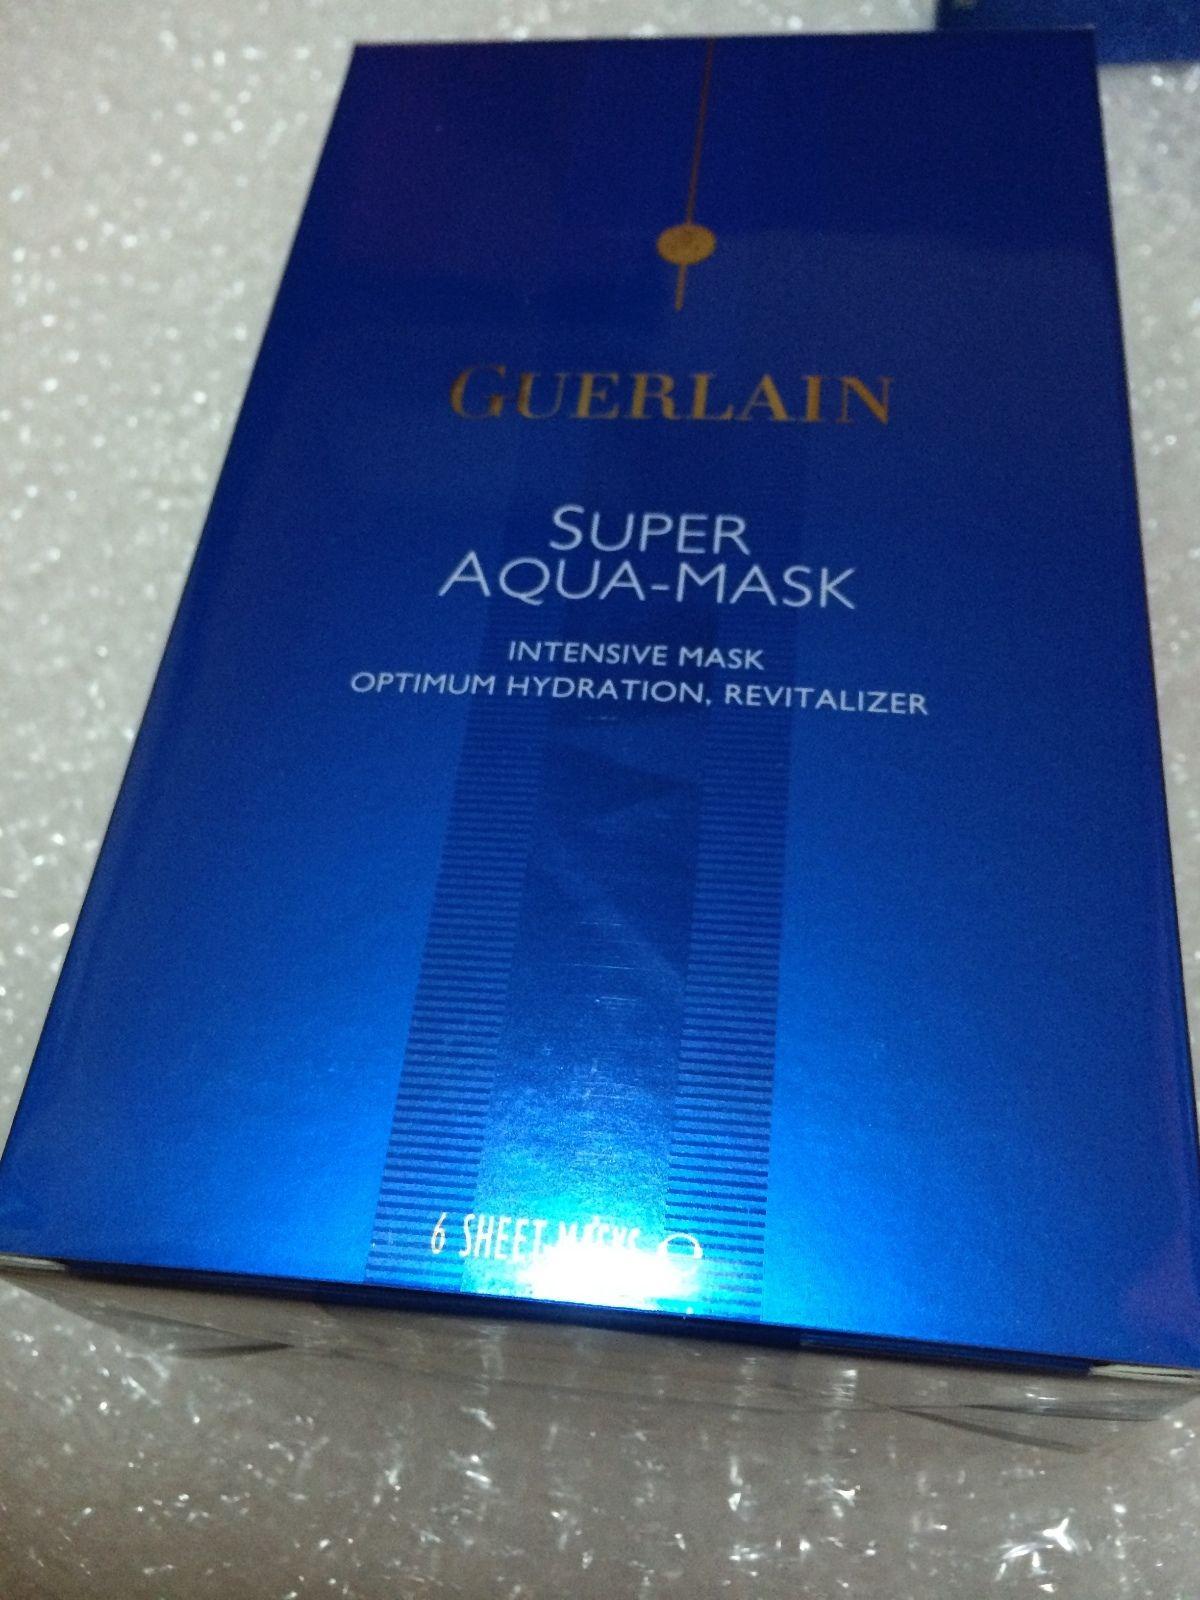 Mặt nạ gel Guerlain INTENSIVE MASK OPTIMUM HYDRATION REVITALIZER